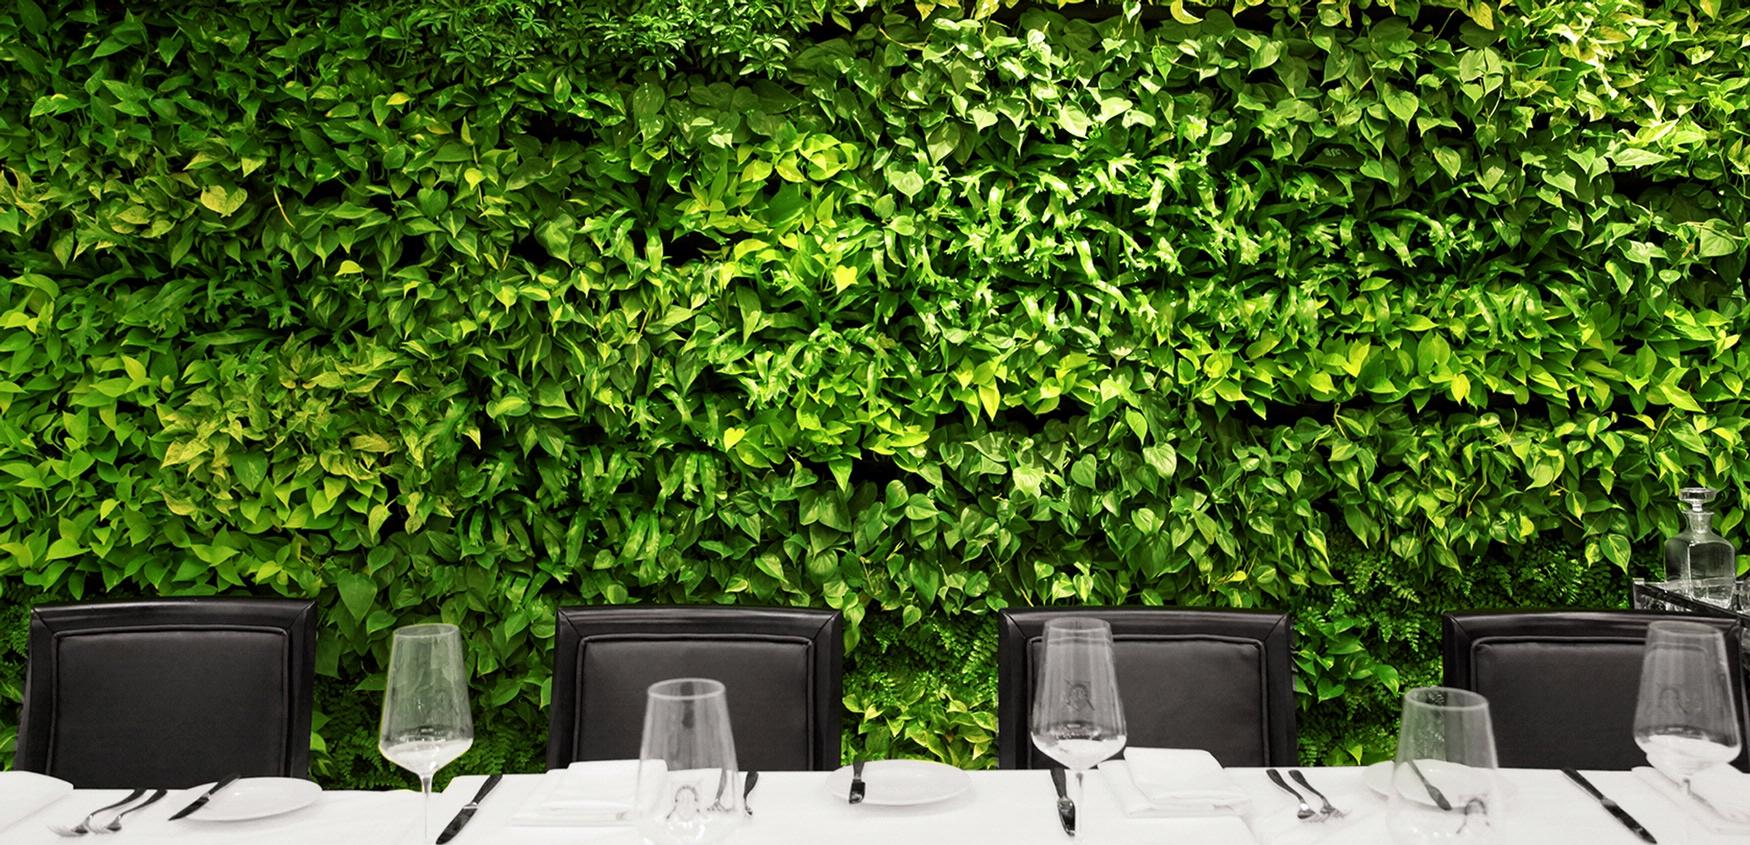 zeleni-zid-vertikalni-vrt-zelena-fasada